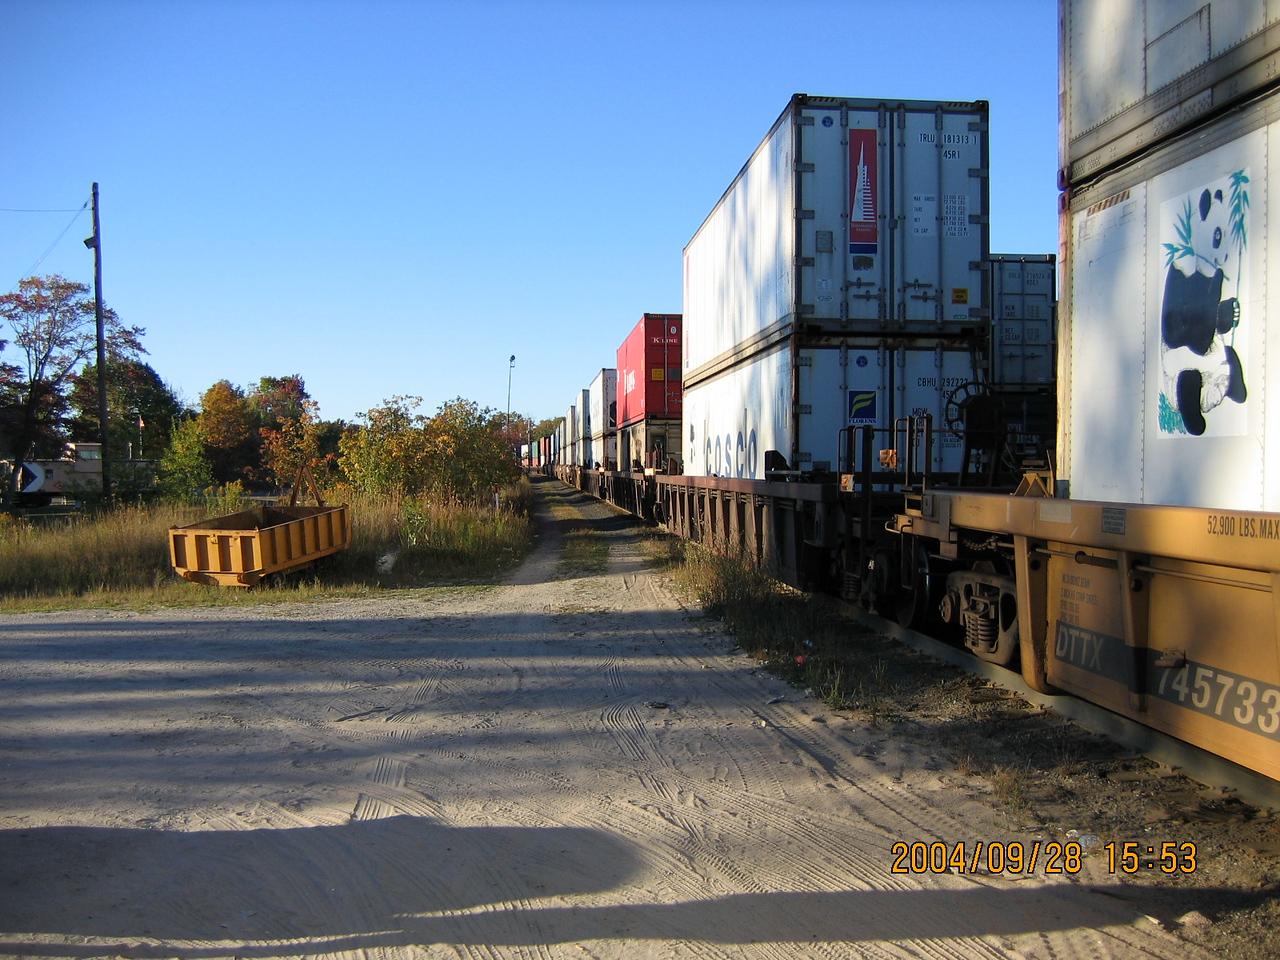 Canadian Pacific Railway - Mactier, Ontario